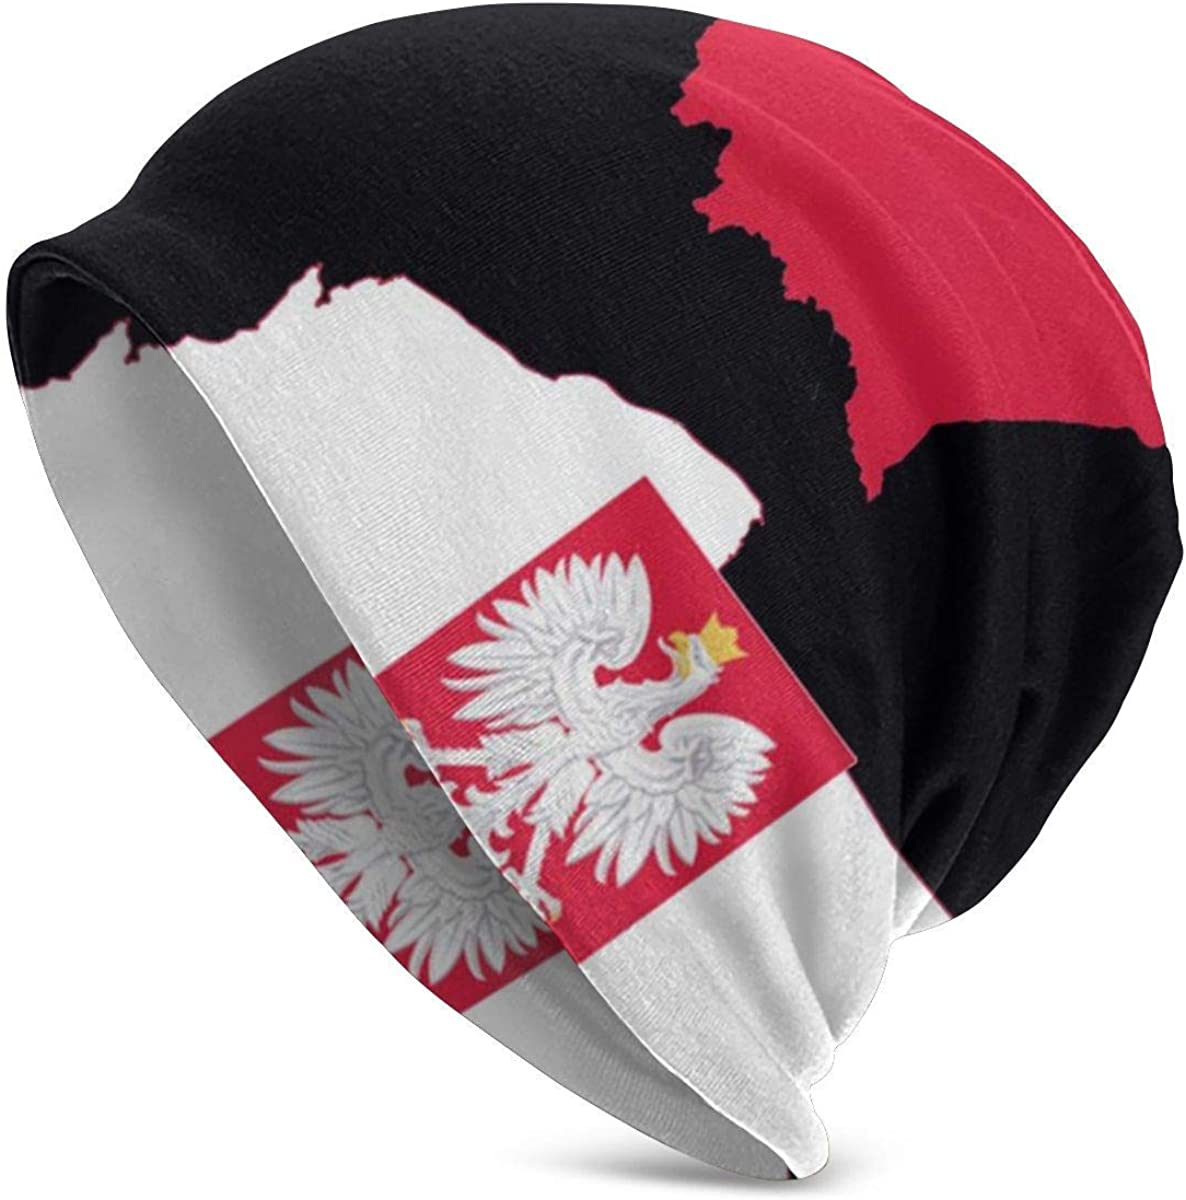 Lsjuee para hombre mapa de Polonia bandera polaca gorro hombres mujeres Unisex suave con puños lisos gorro de punto de calavera gorro de punto diario